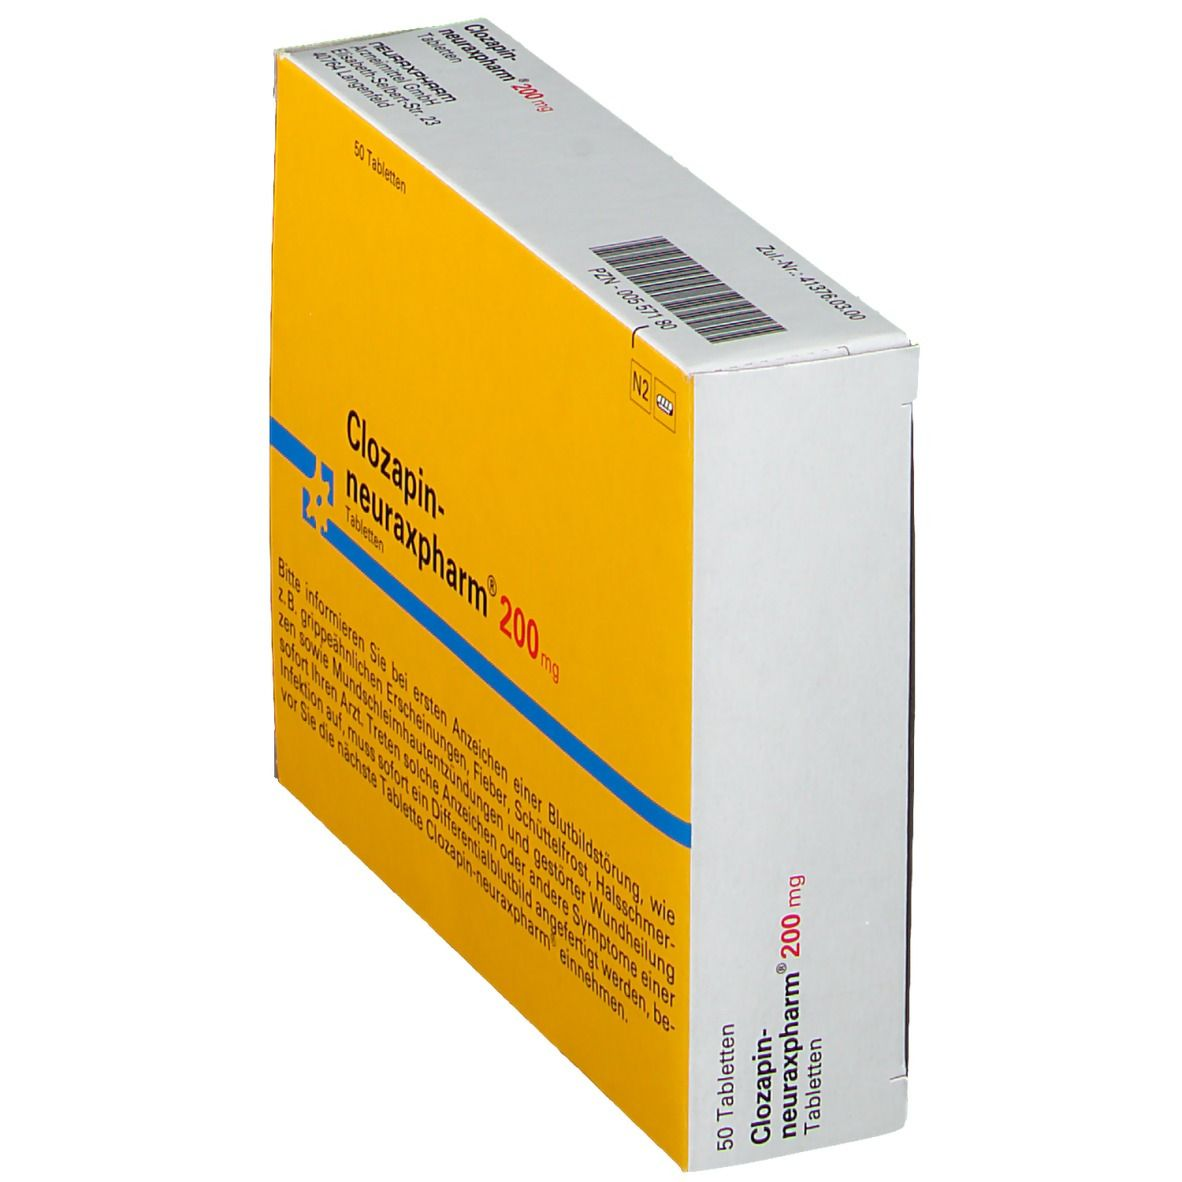 Clozapin neuraxpharm 200 Tabl.